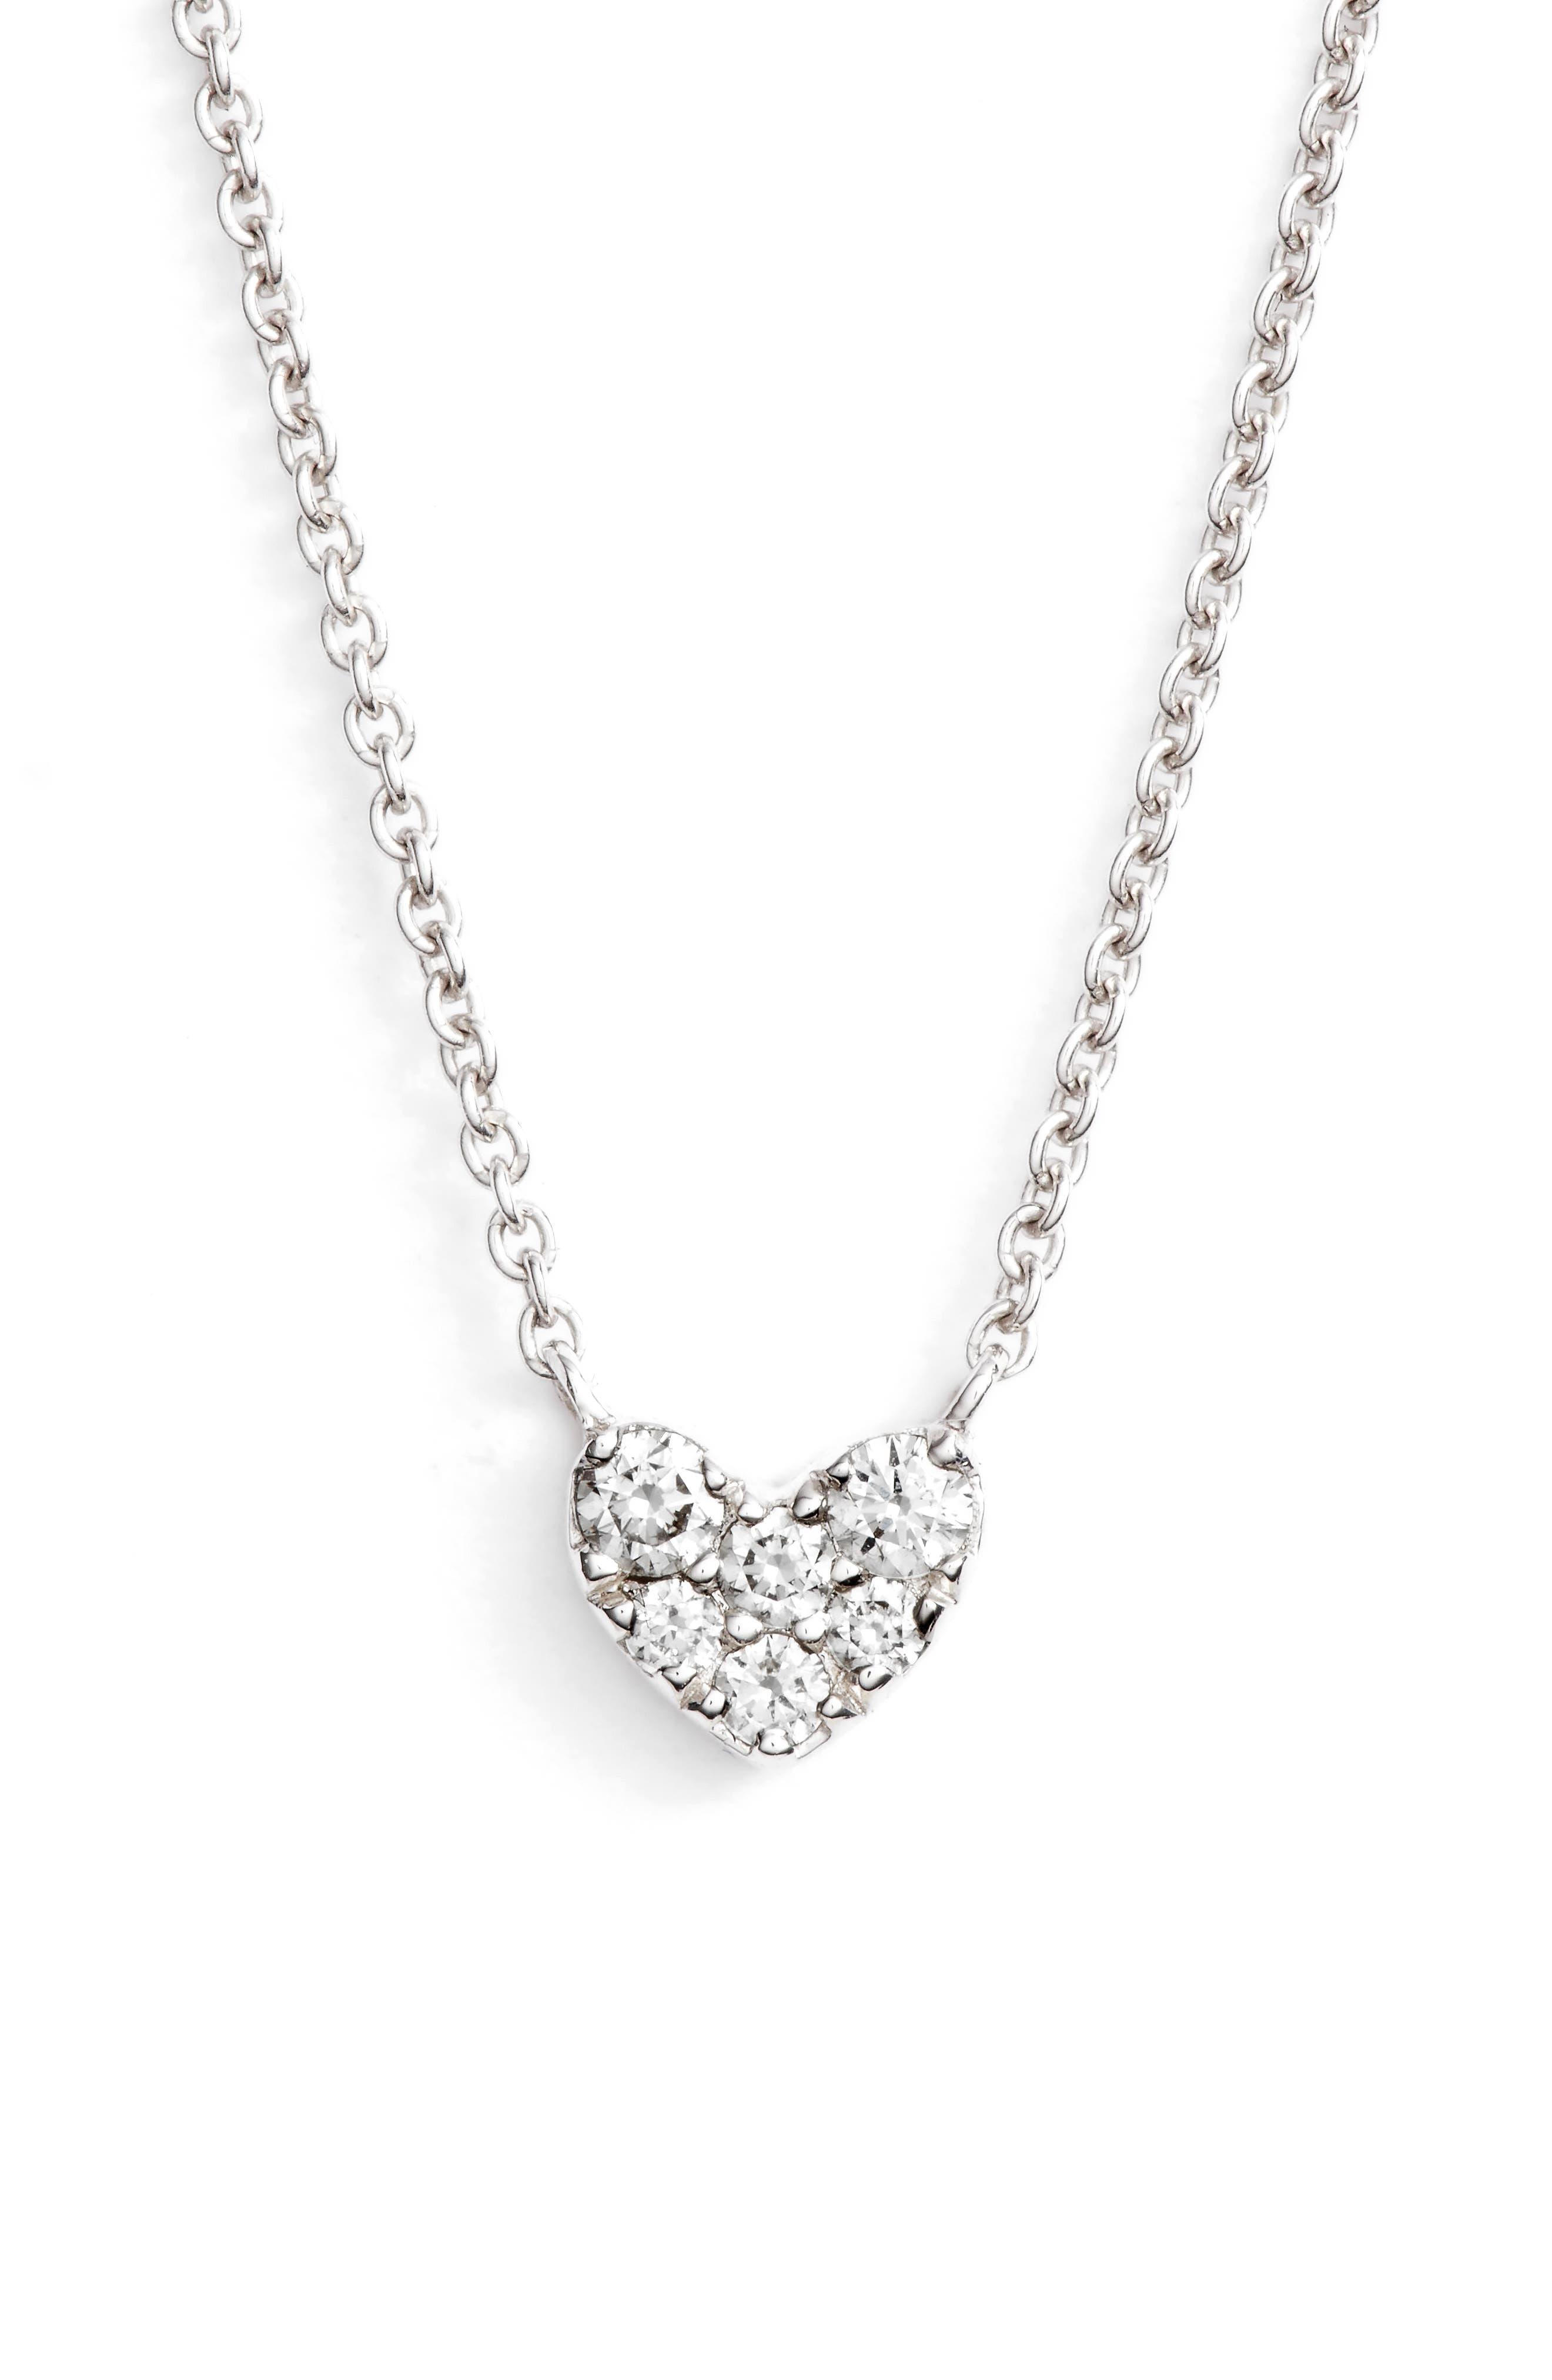 Pavé Diamond Heart Pendant Necklace,                             Main thumbnail 1, color,                             WHITE GOLD/ DIAMOND